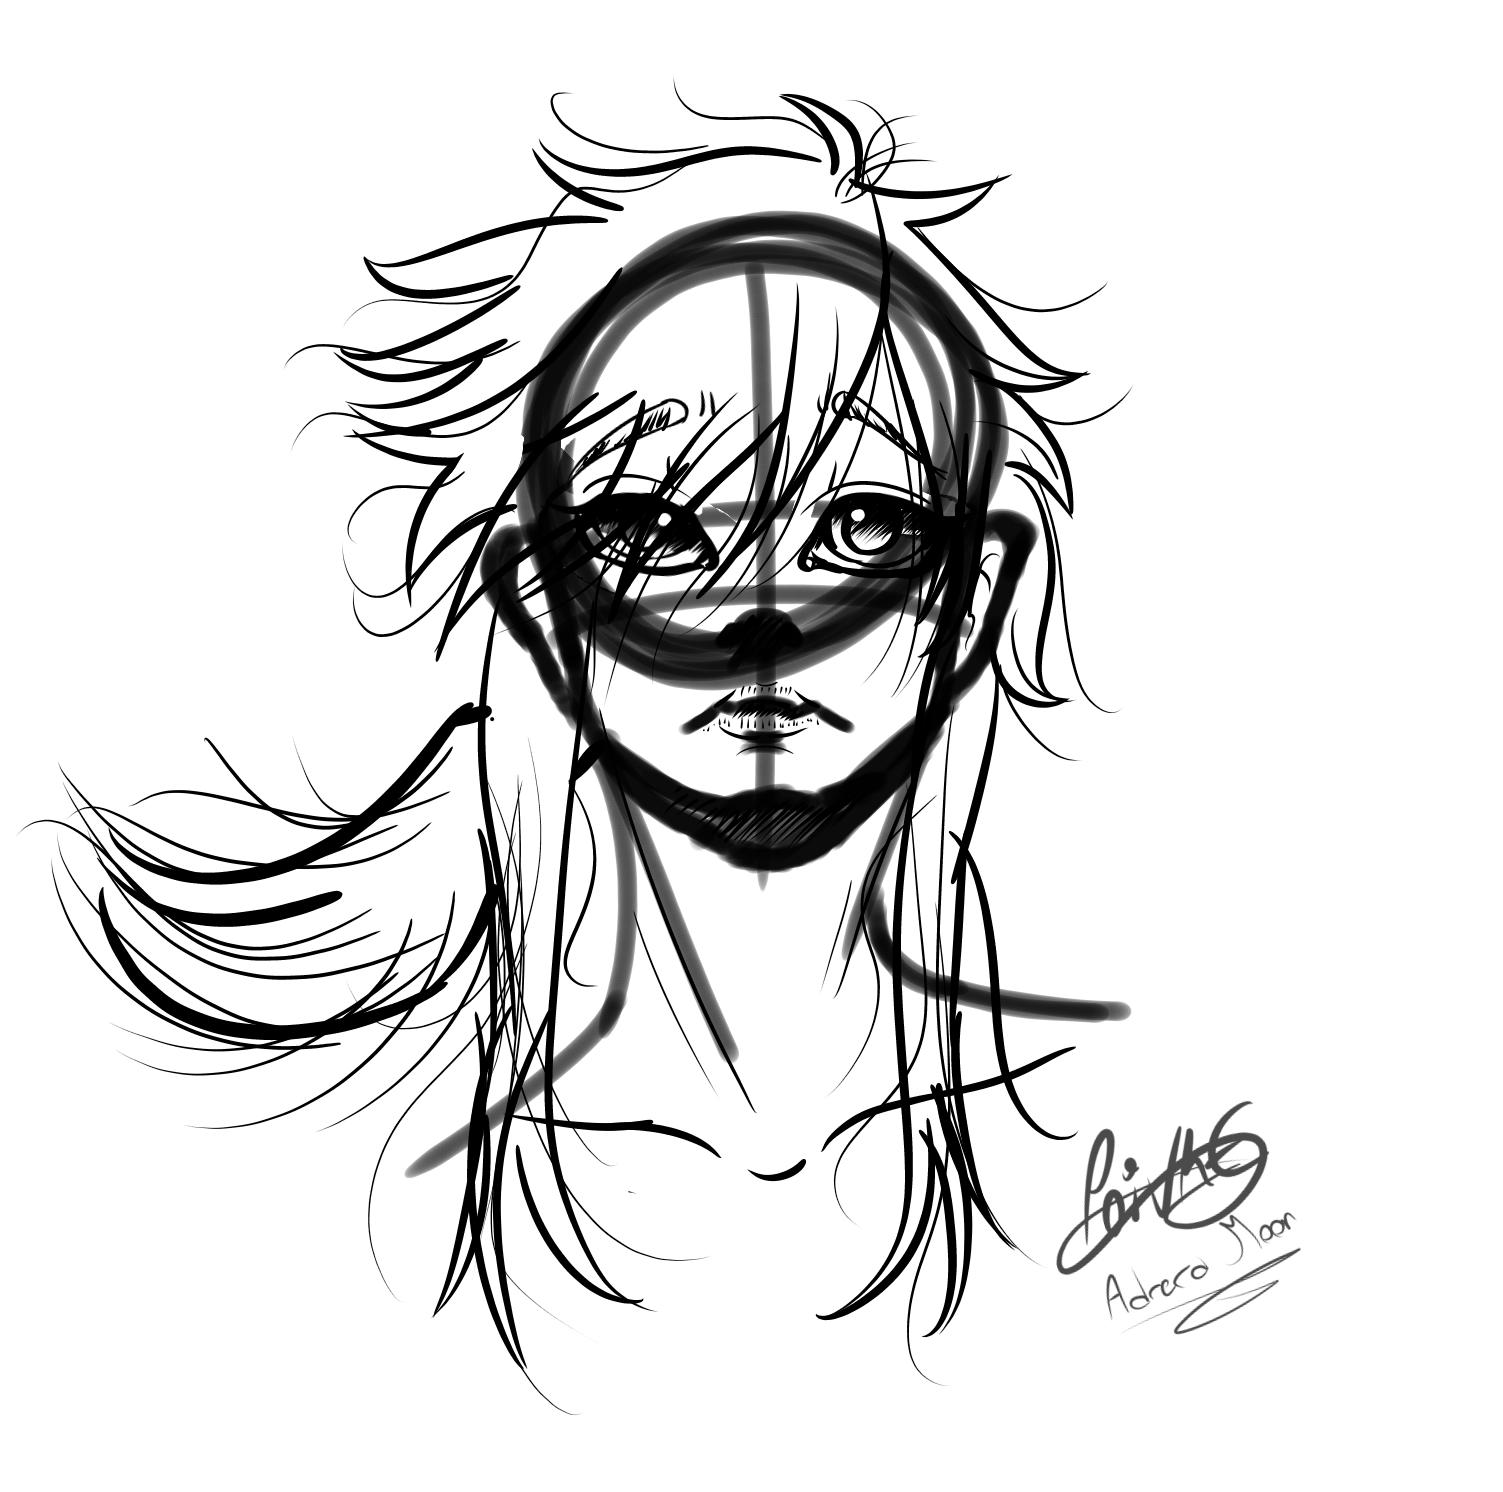 Digital sketch by moondaneka